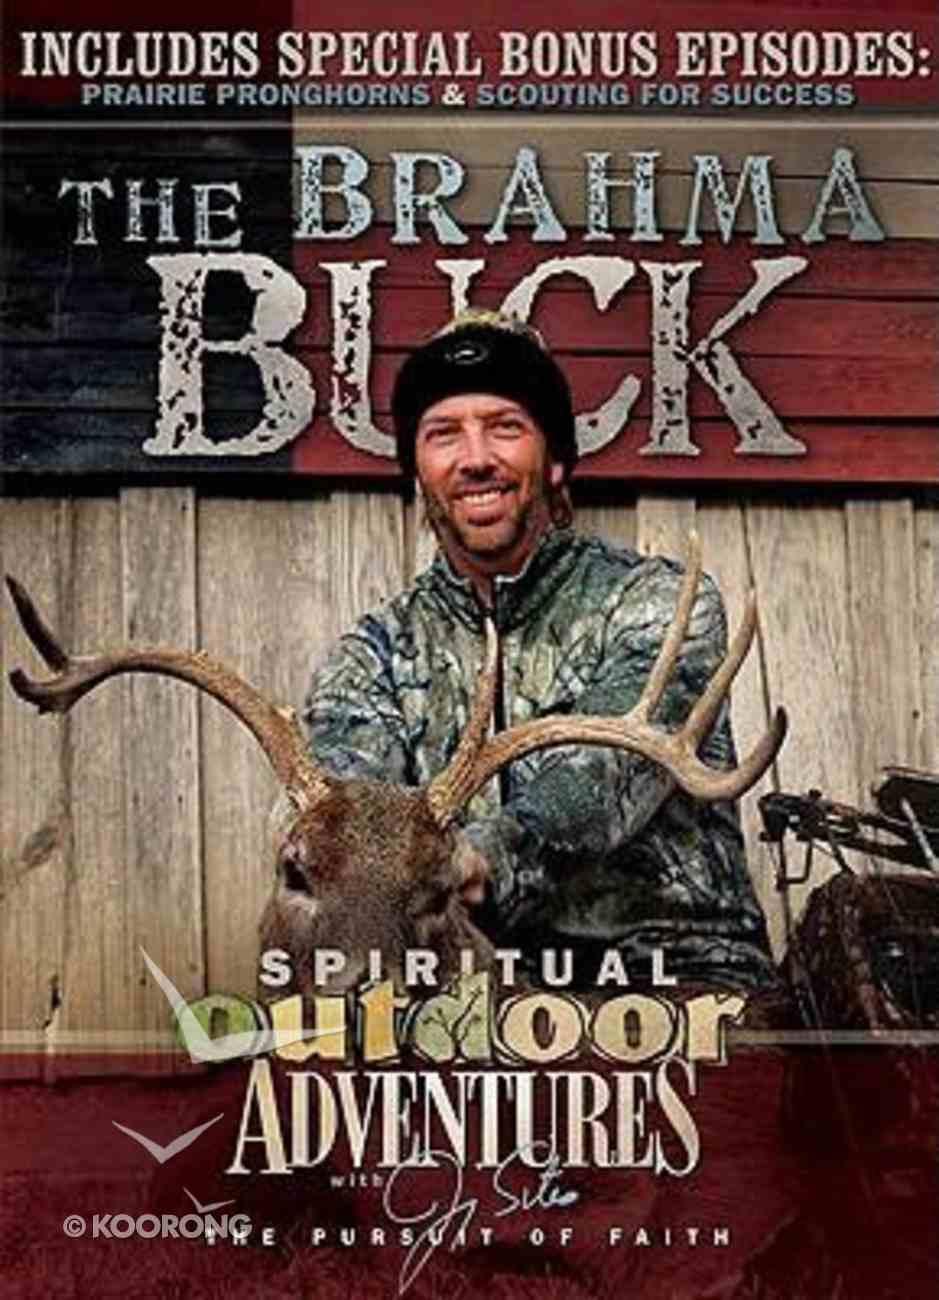 The Brahma Buck (Spiritual Outdoor Adventure Series) DVD